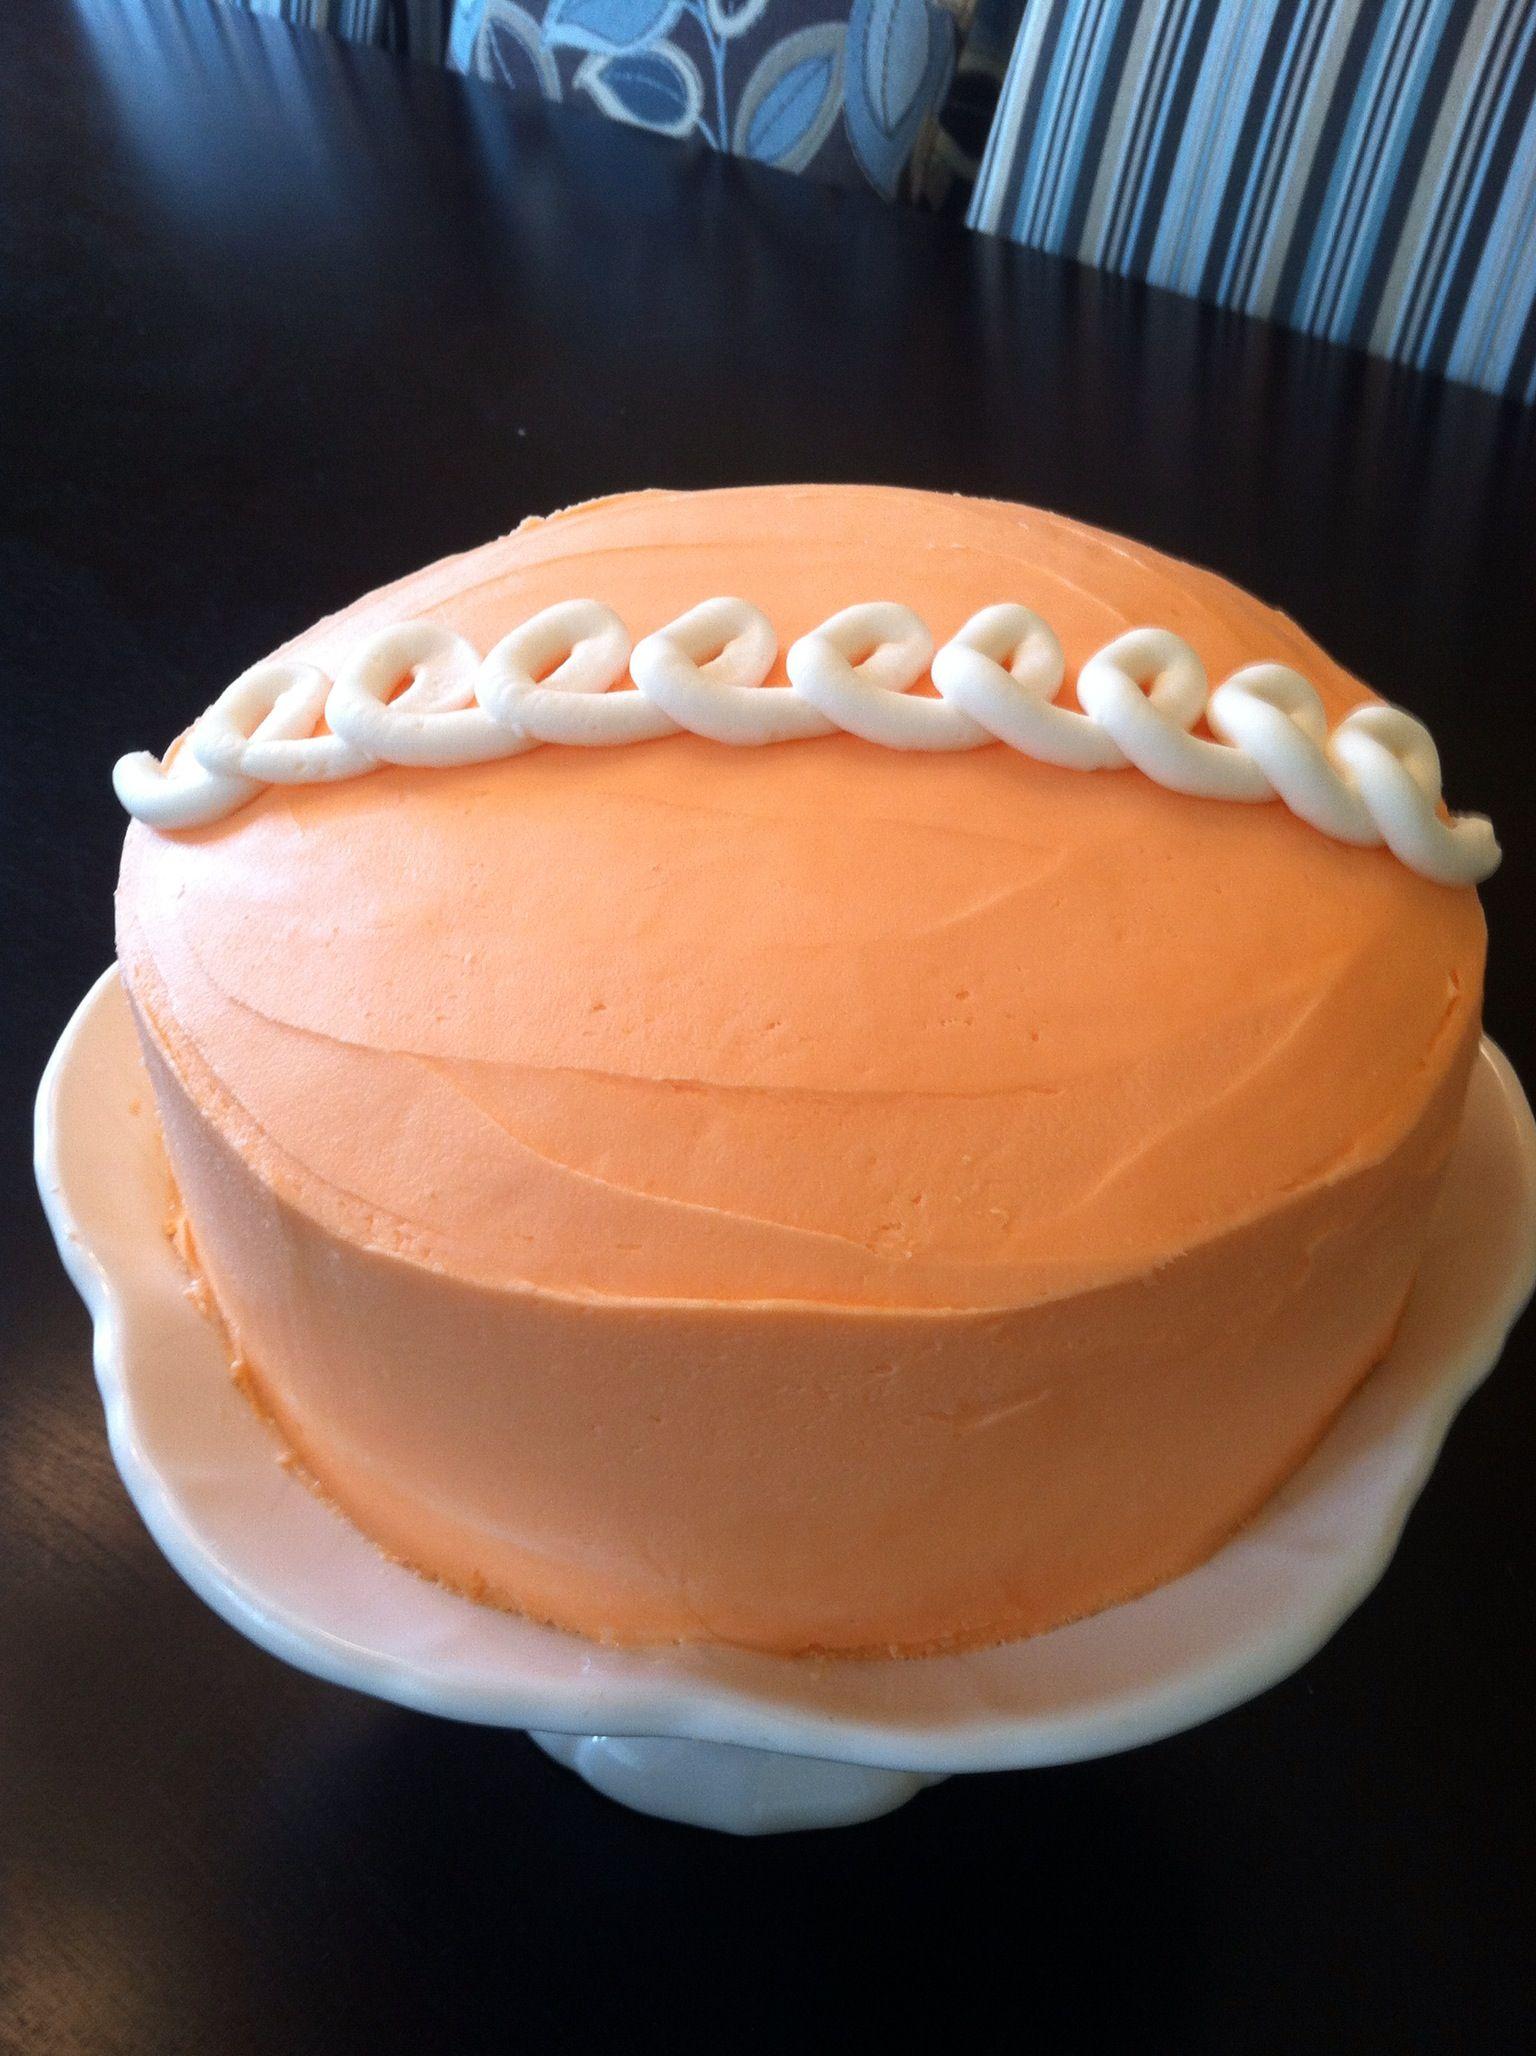 My own version of the Hostess orange cupcake